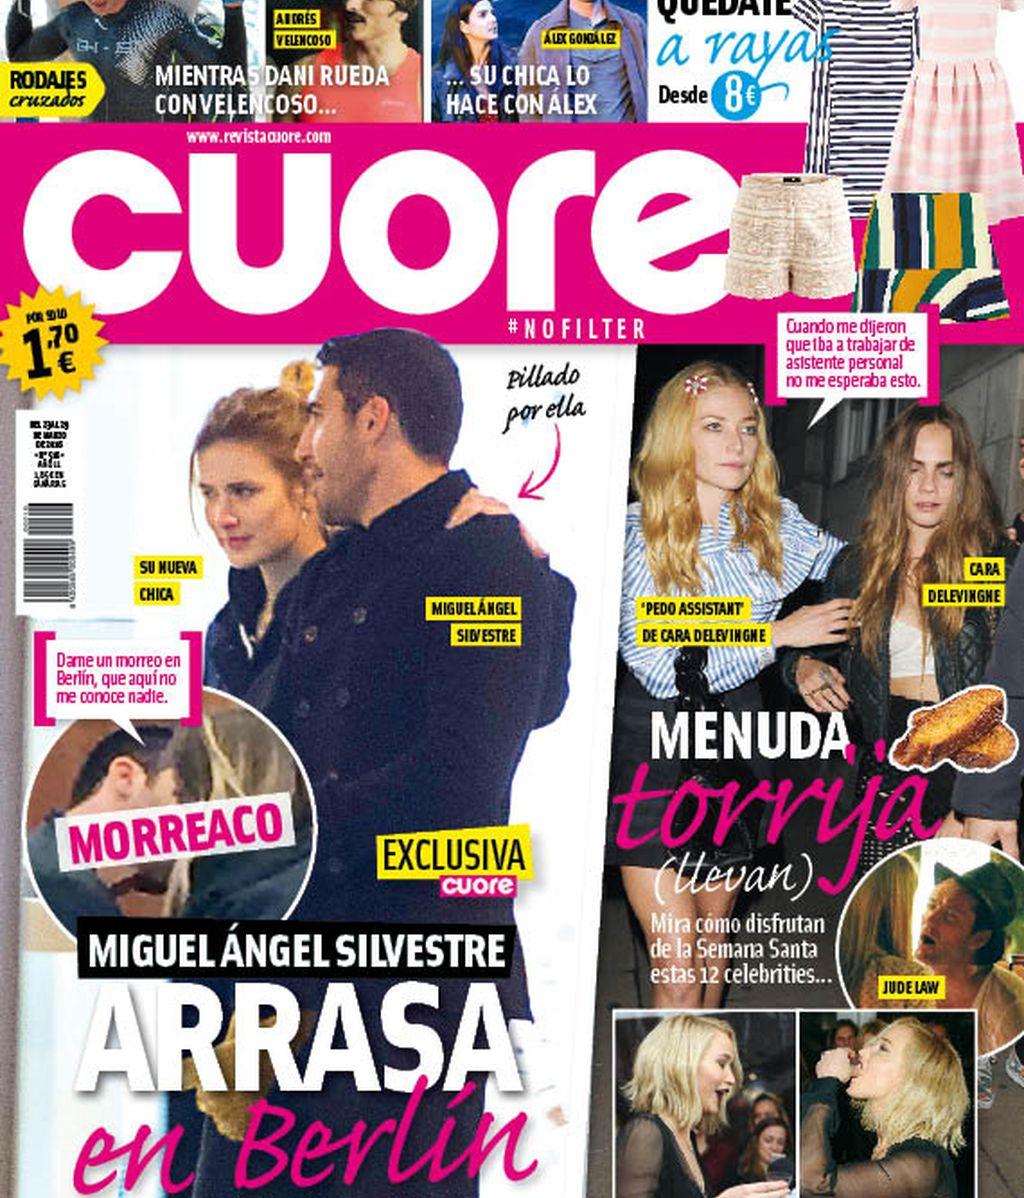 Revista Cuore, portada